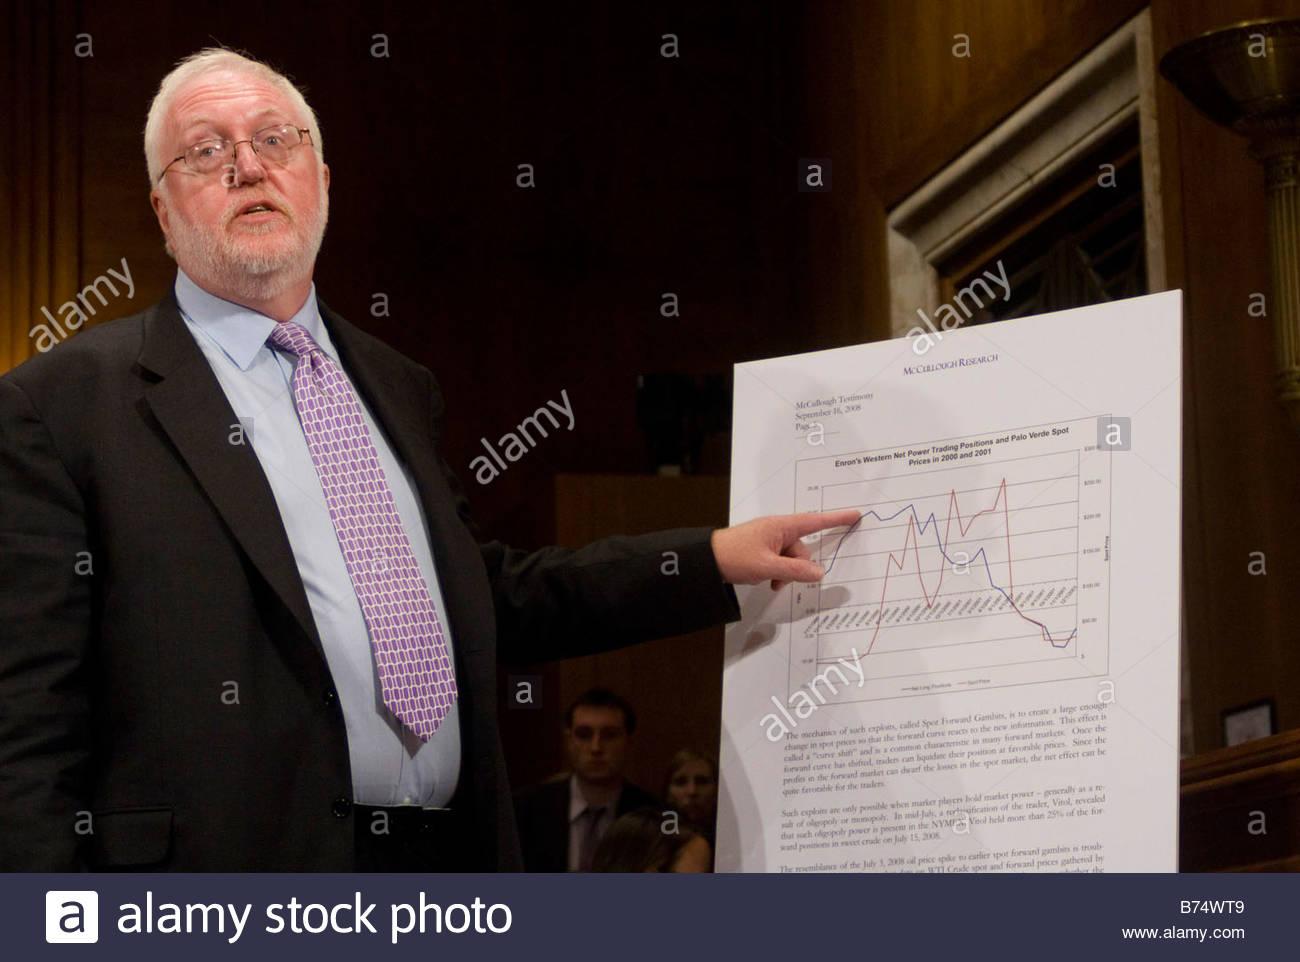 WASHINGTON DC September 16 2008 Robert McCullough managing partner of McCullough Research testifies before the Senate - Stock Image